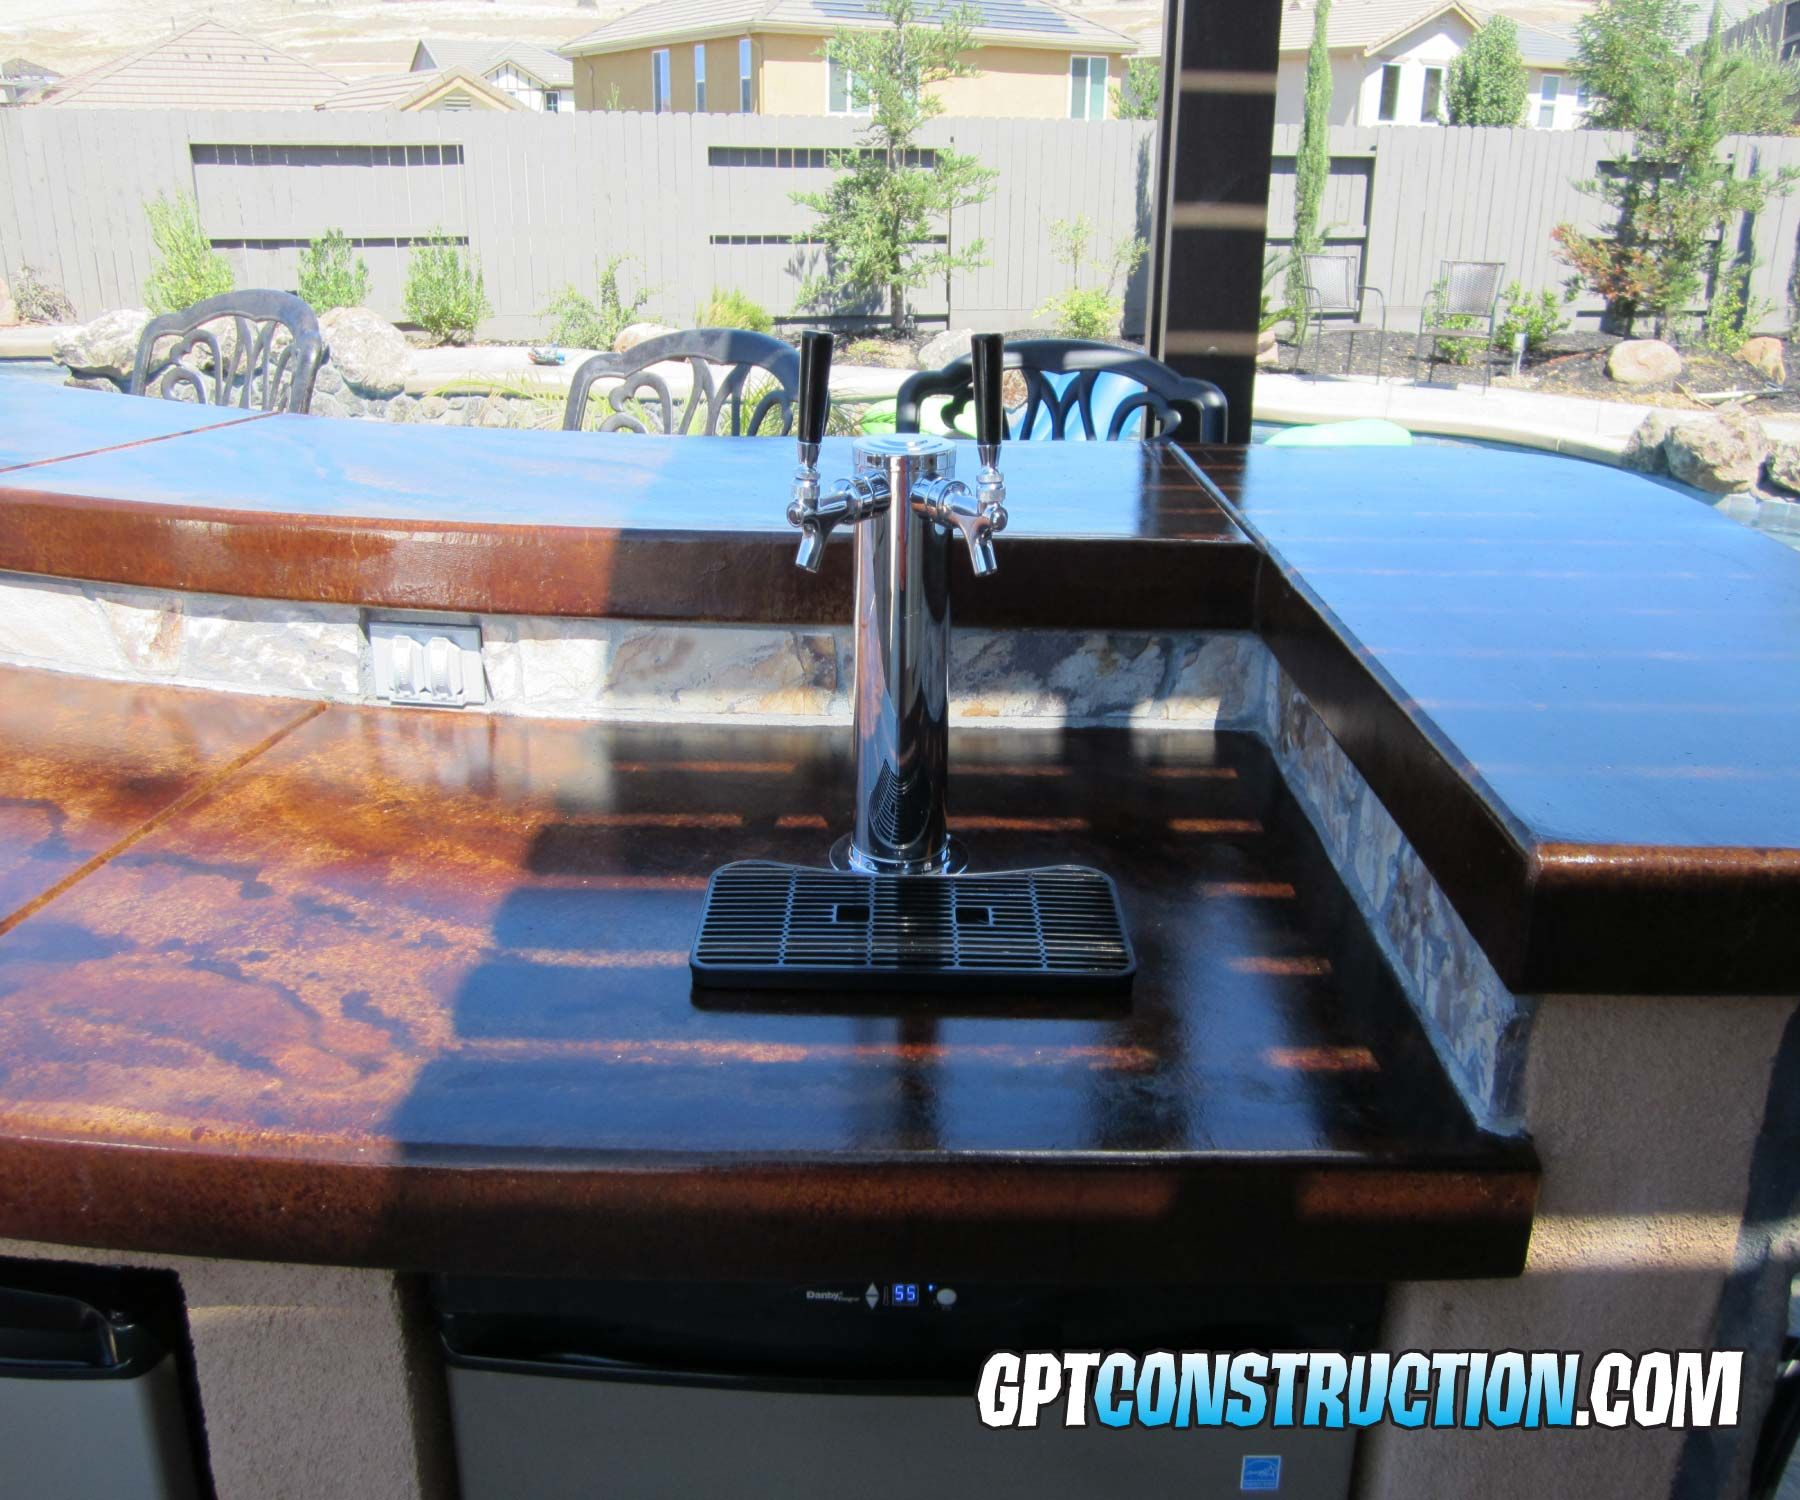 Kitchen Design Sacramento Outdoor Kitchen Bbq Island With Dual Tap Kegerator Gpt